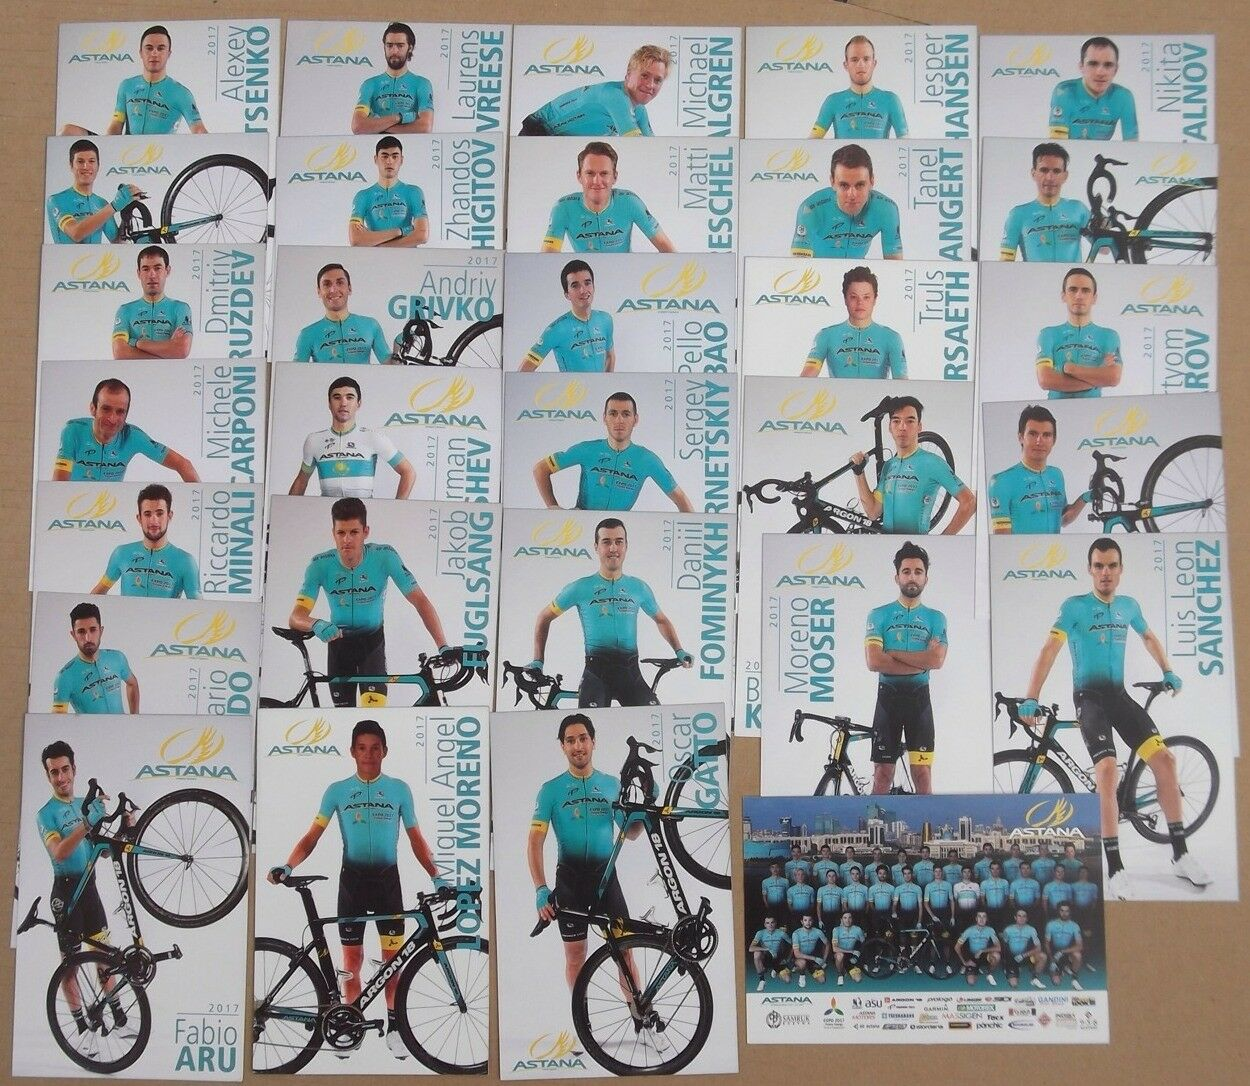 CYCLISME Jeu De Photo Astana Du TOUR DE FRANCE FRANCE FRANCE 2017 edd21b